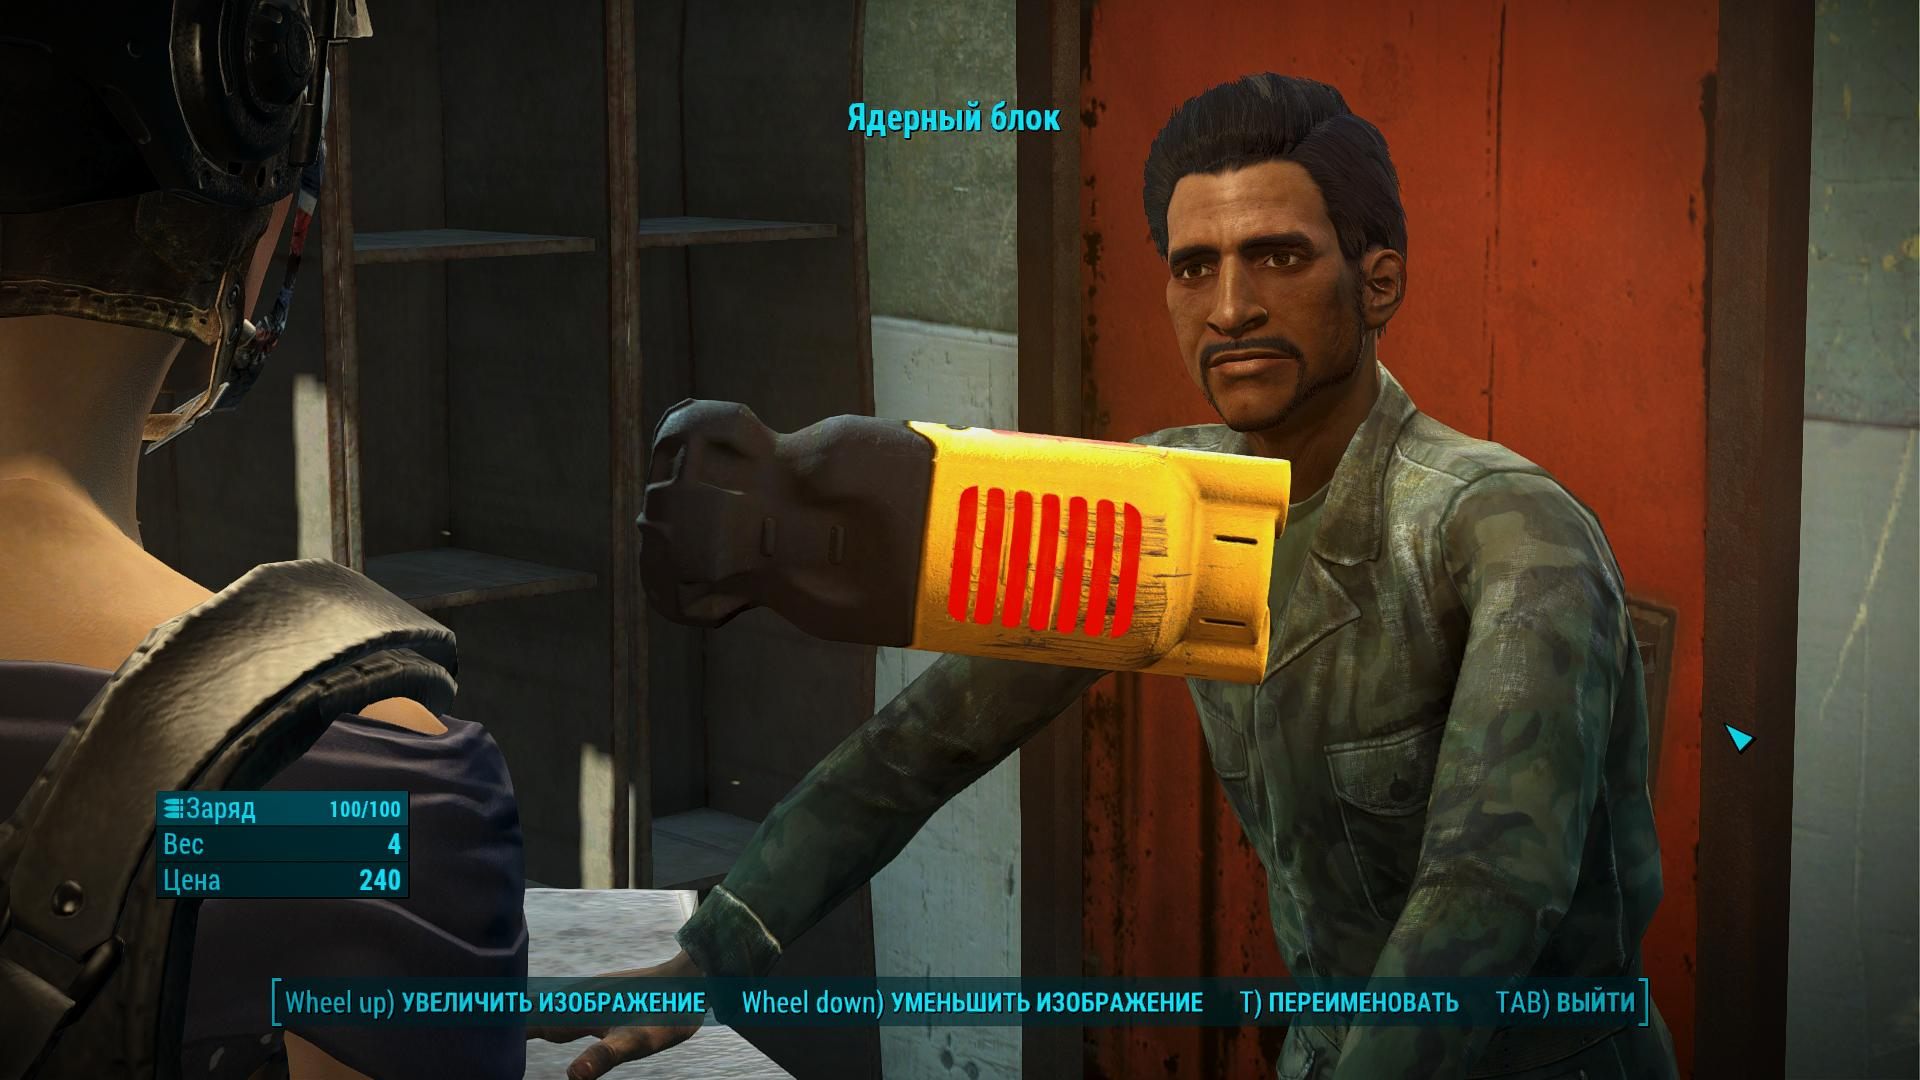 000530.Jpg - Fallout 4